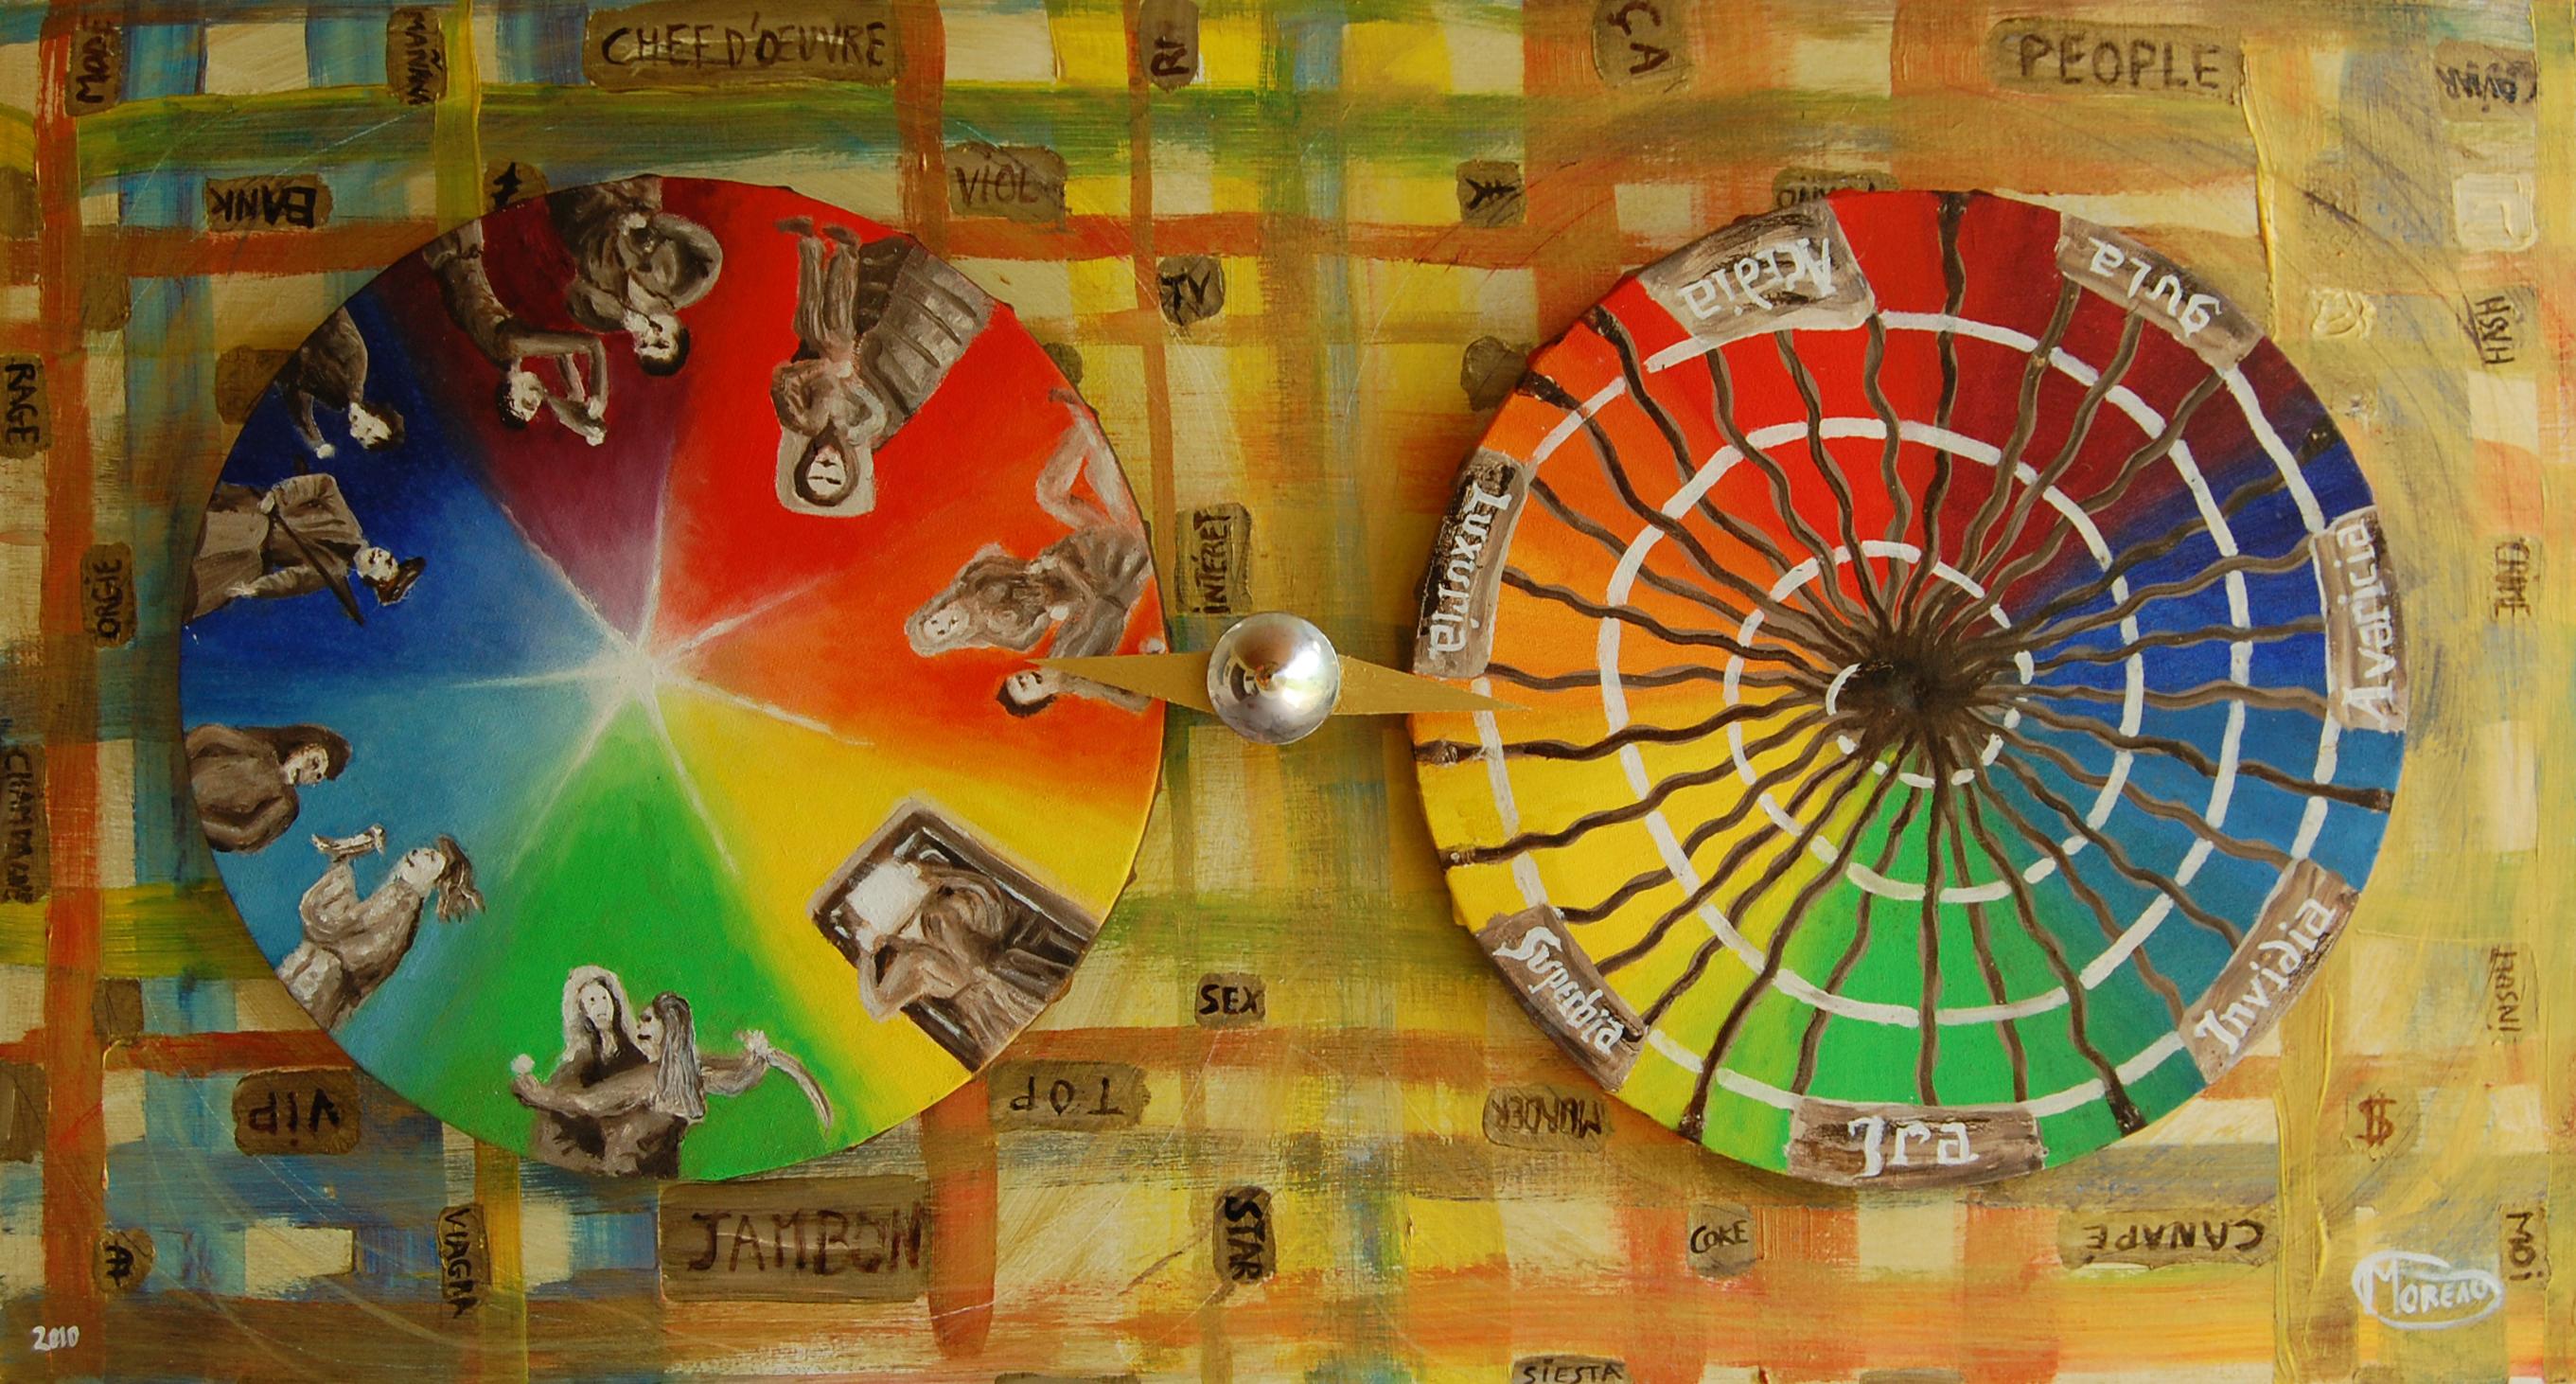 OmorO - Les 7 péchés capitaux (PopBosh) - 2010